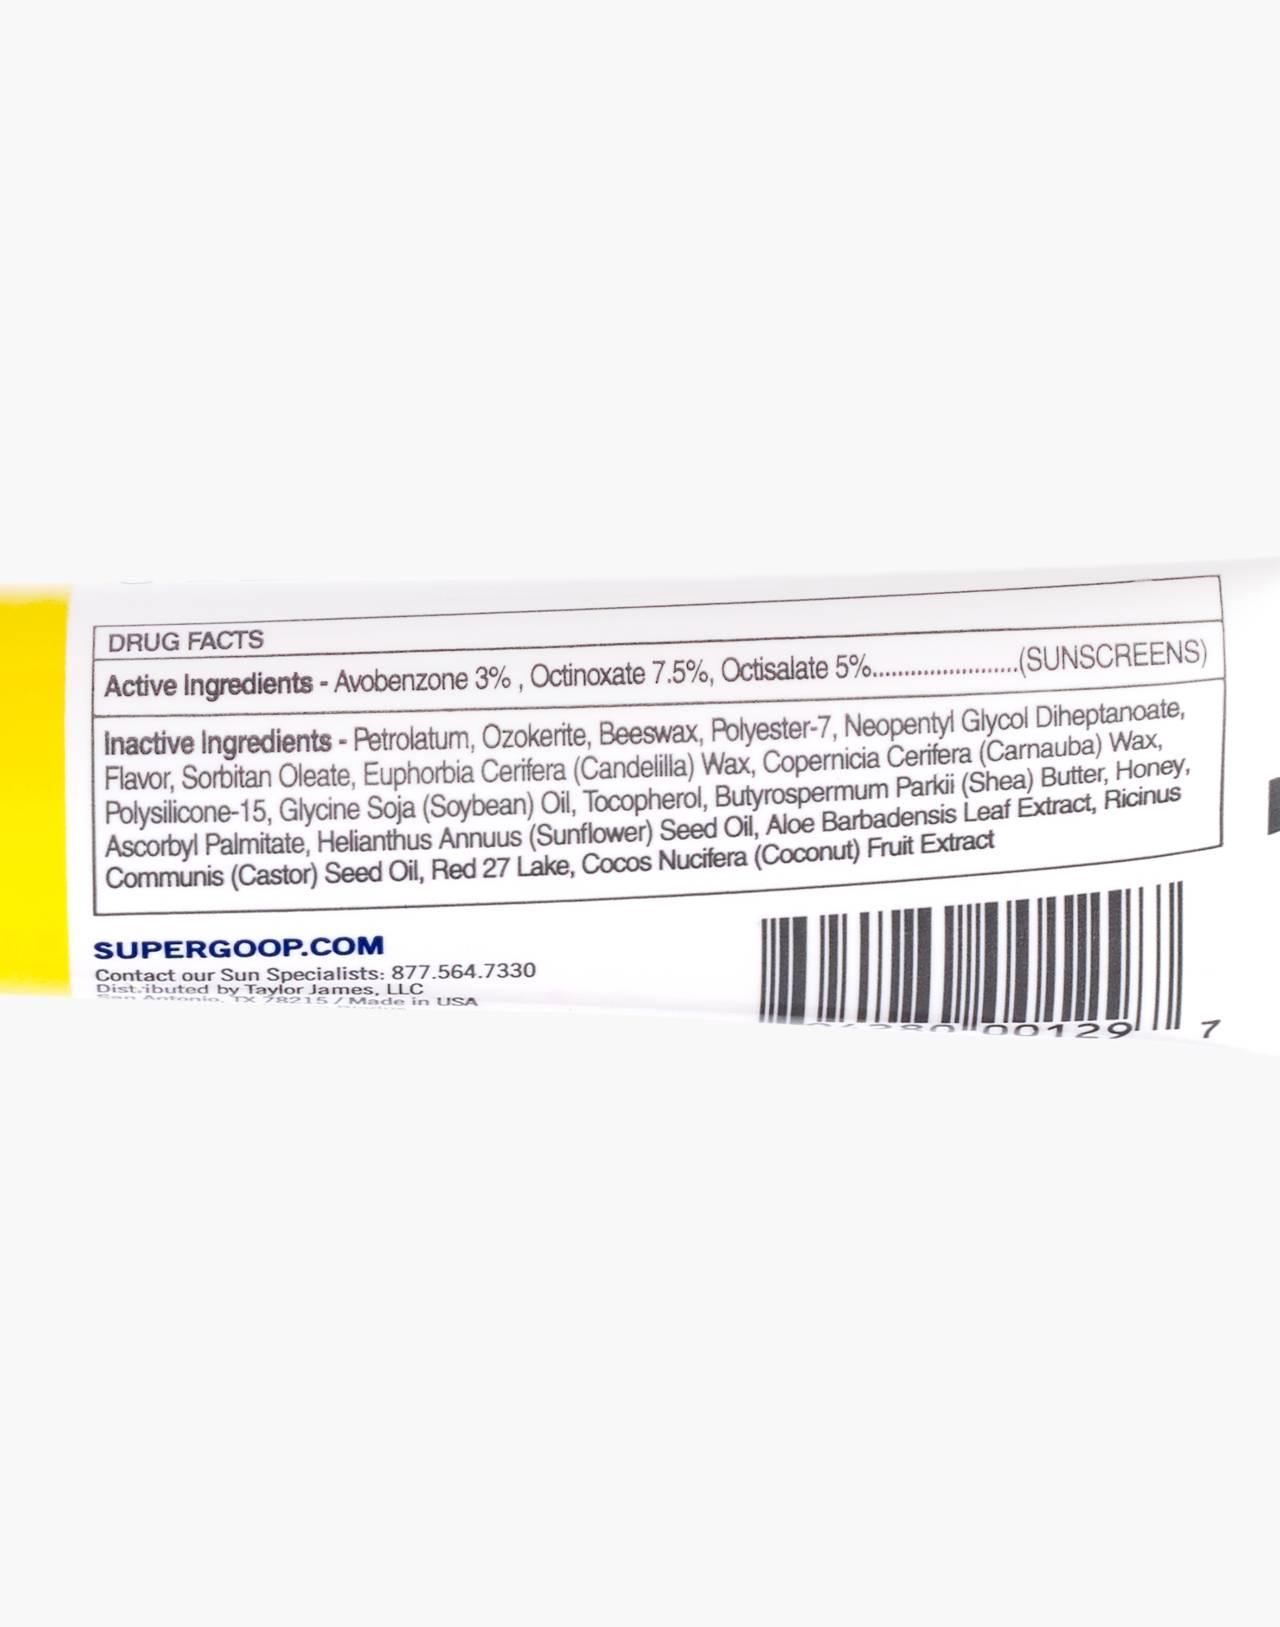 Supergoop!® Acai Fusion Lip Balm in spf 30 image 2